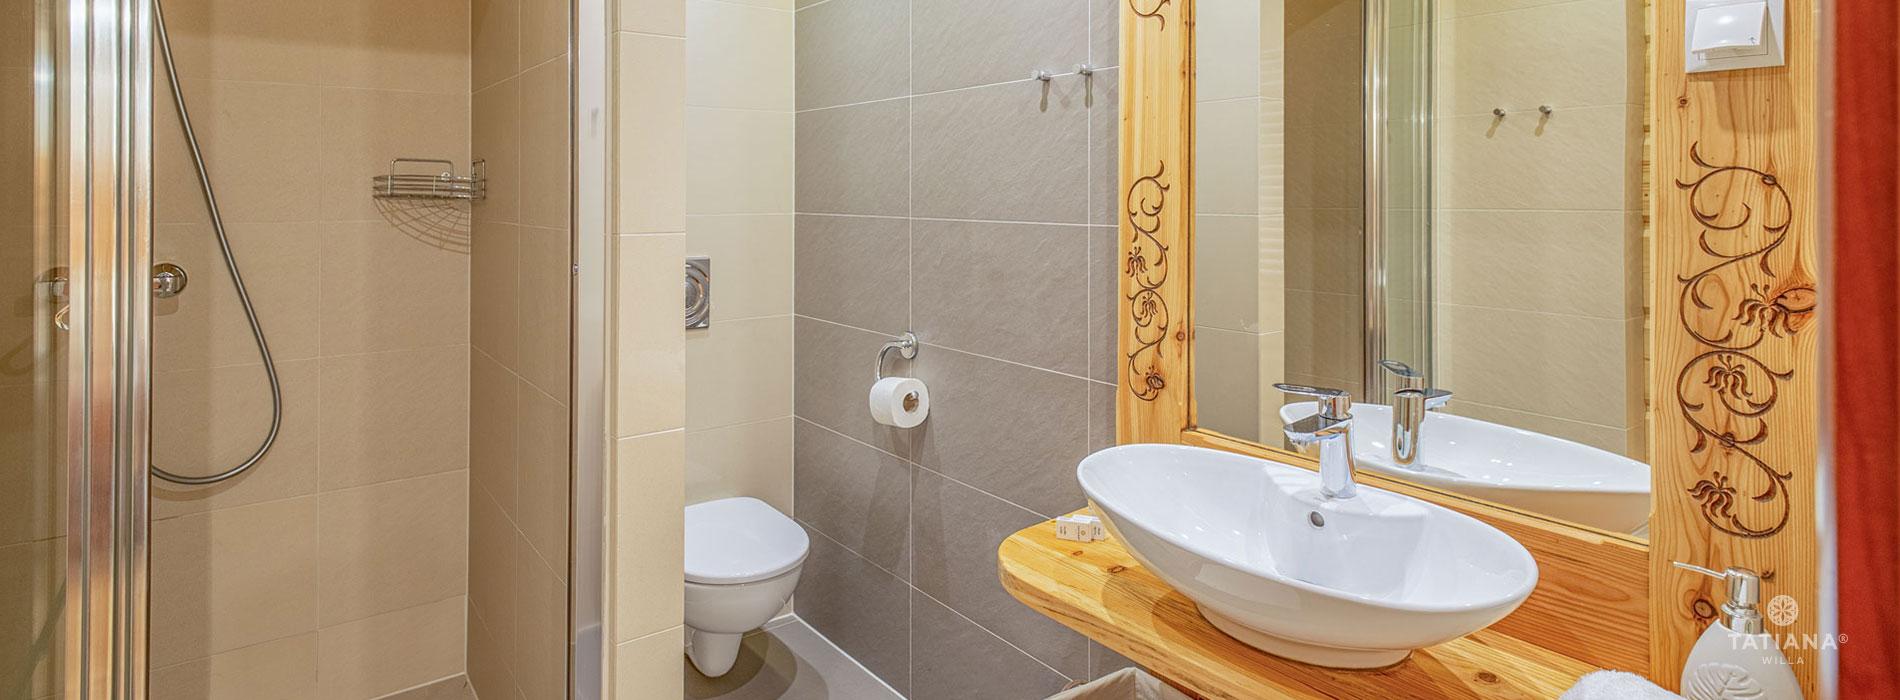 Apartament Premium 7 - łazienka